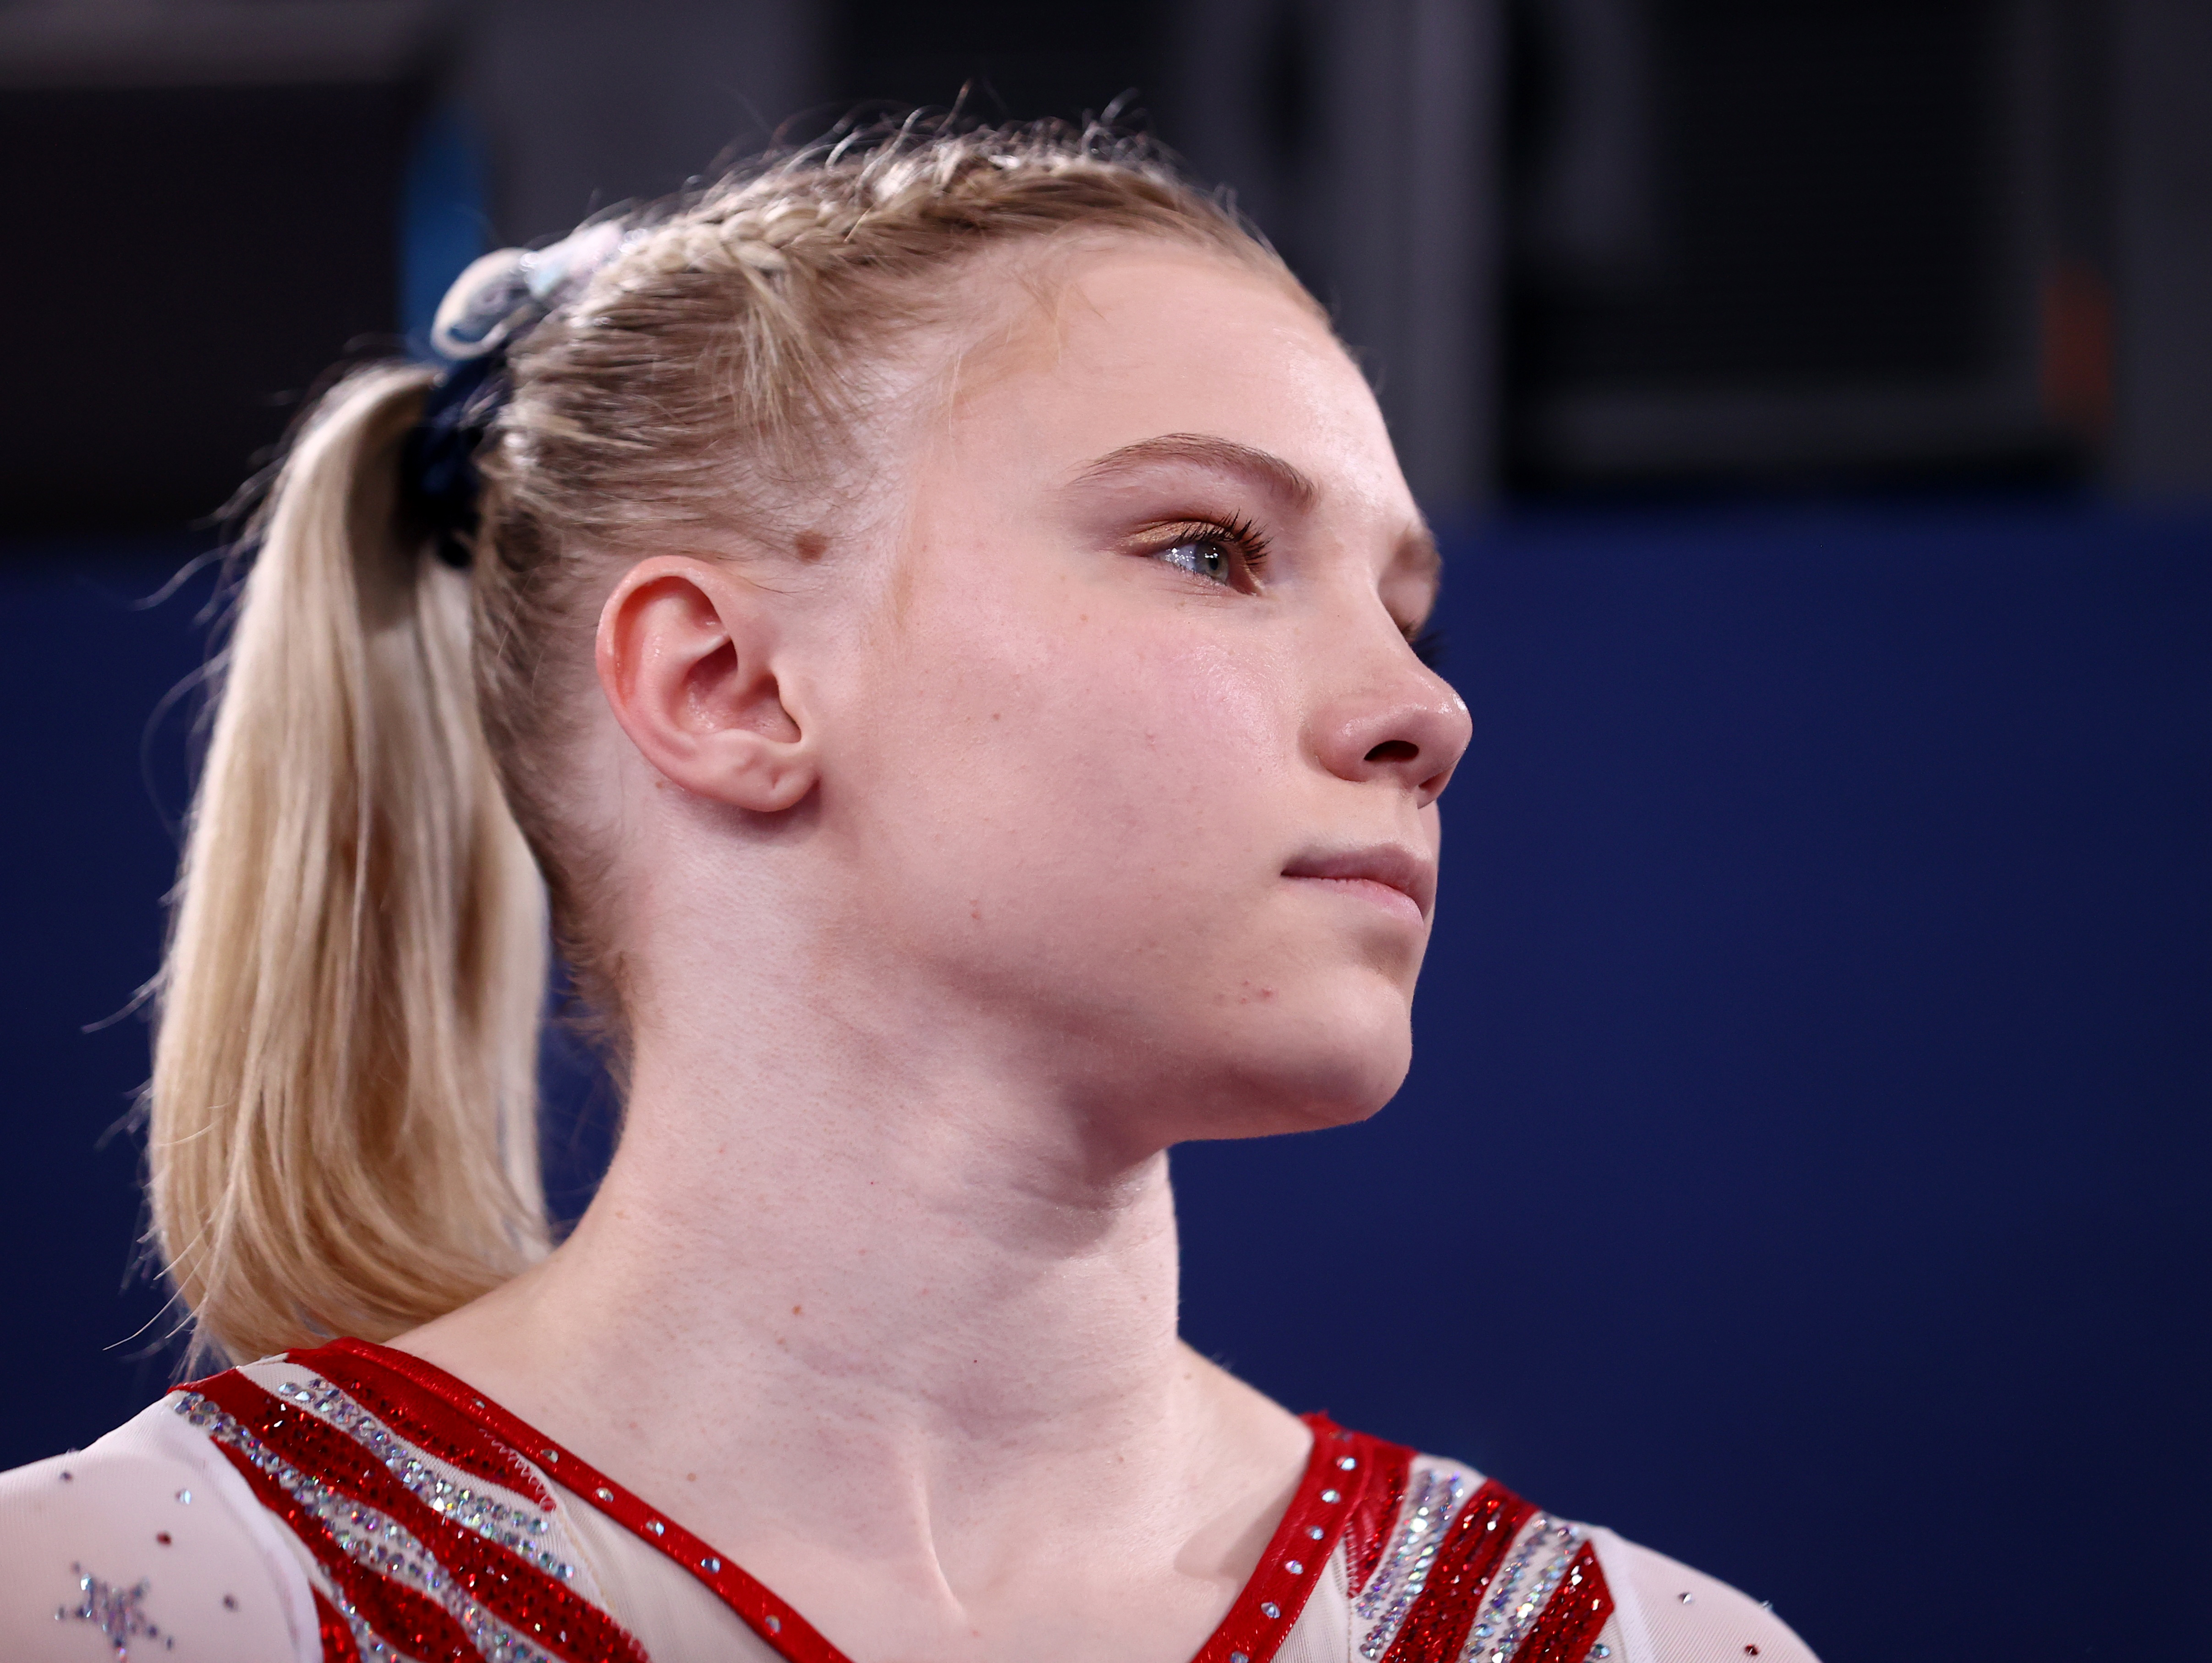 Tokyo 2020 Olympics - Gymnastics - Artistic - Women's Floor Exercise - Final - Ariake Gymnastics Centre, Tokyo, Japan - August 2, 2021.  Jade Carey of the United States looks on. REUTERS/Lindsey Wasson